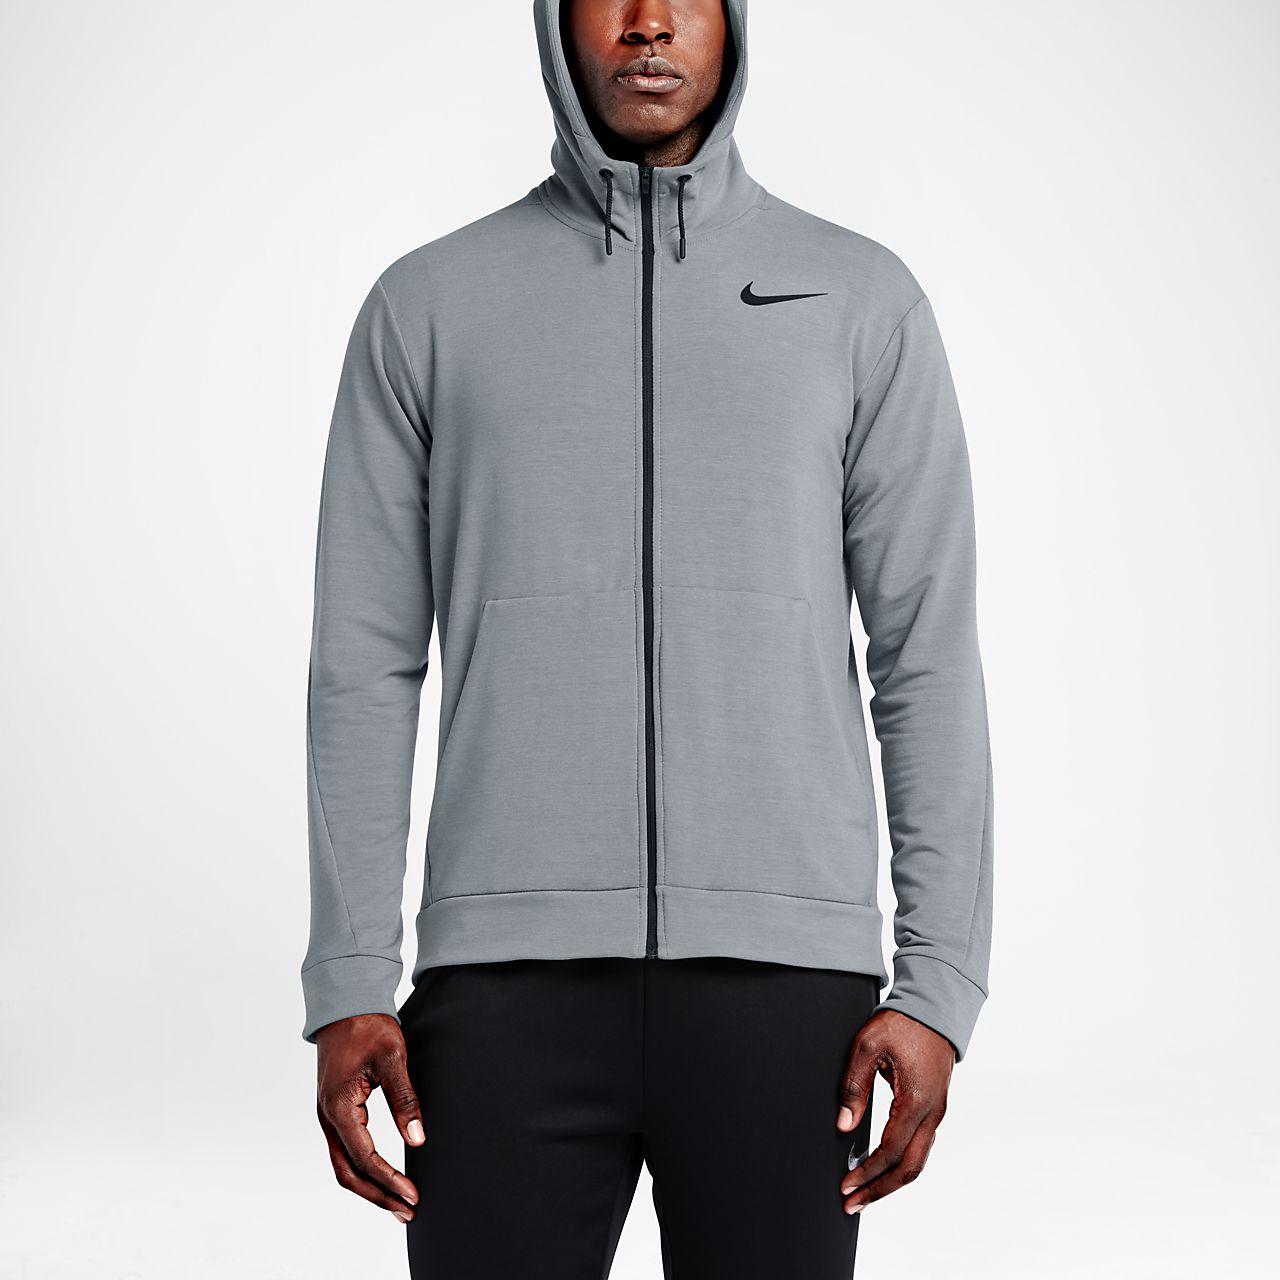 ... Nike Dri-FIT Men\u0027s Training Full-Zip Hoodie